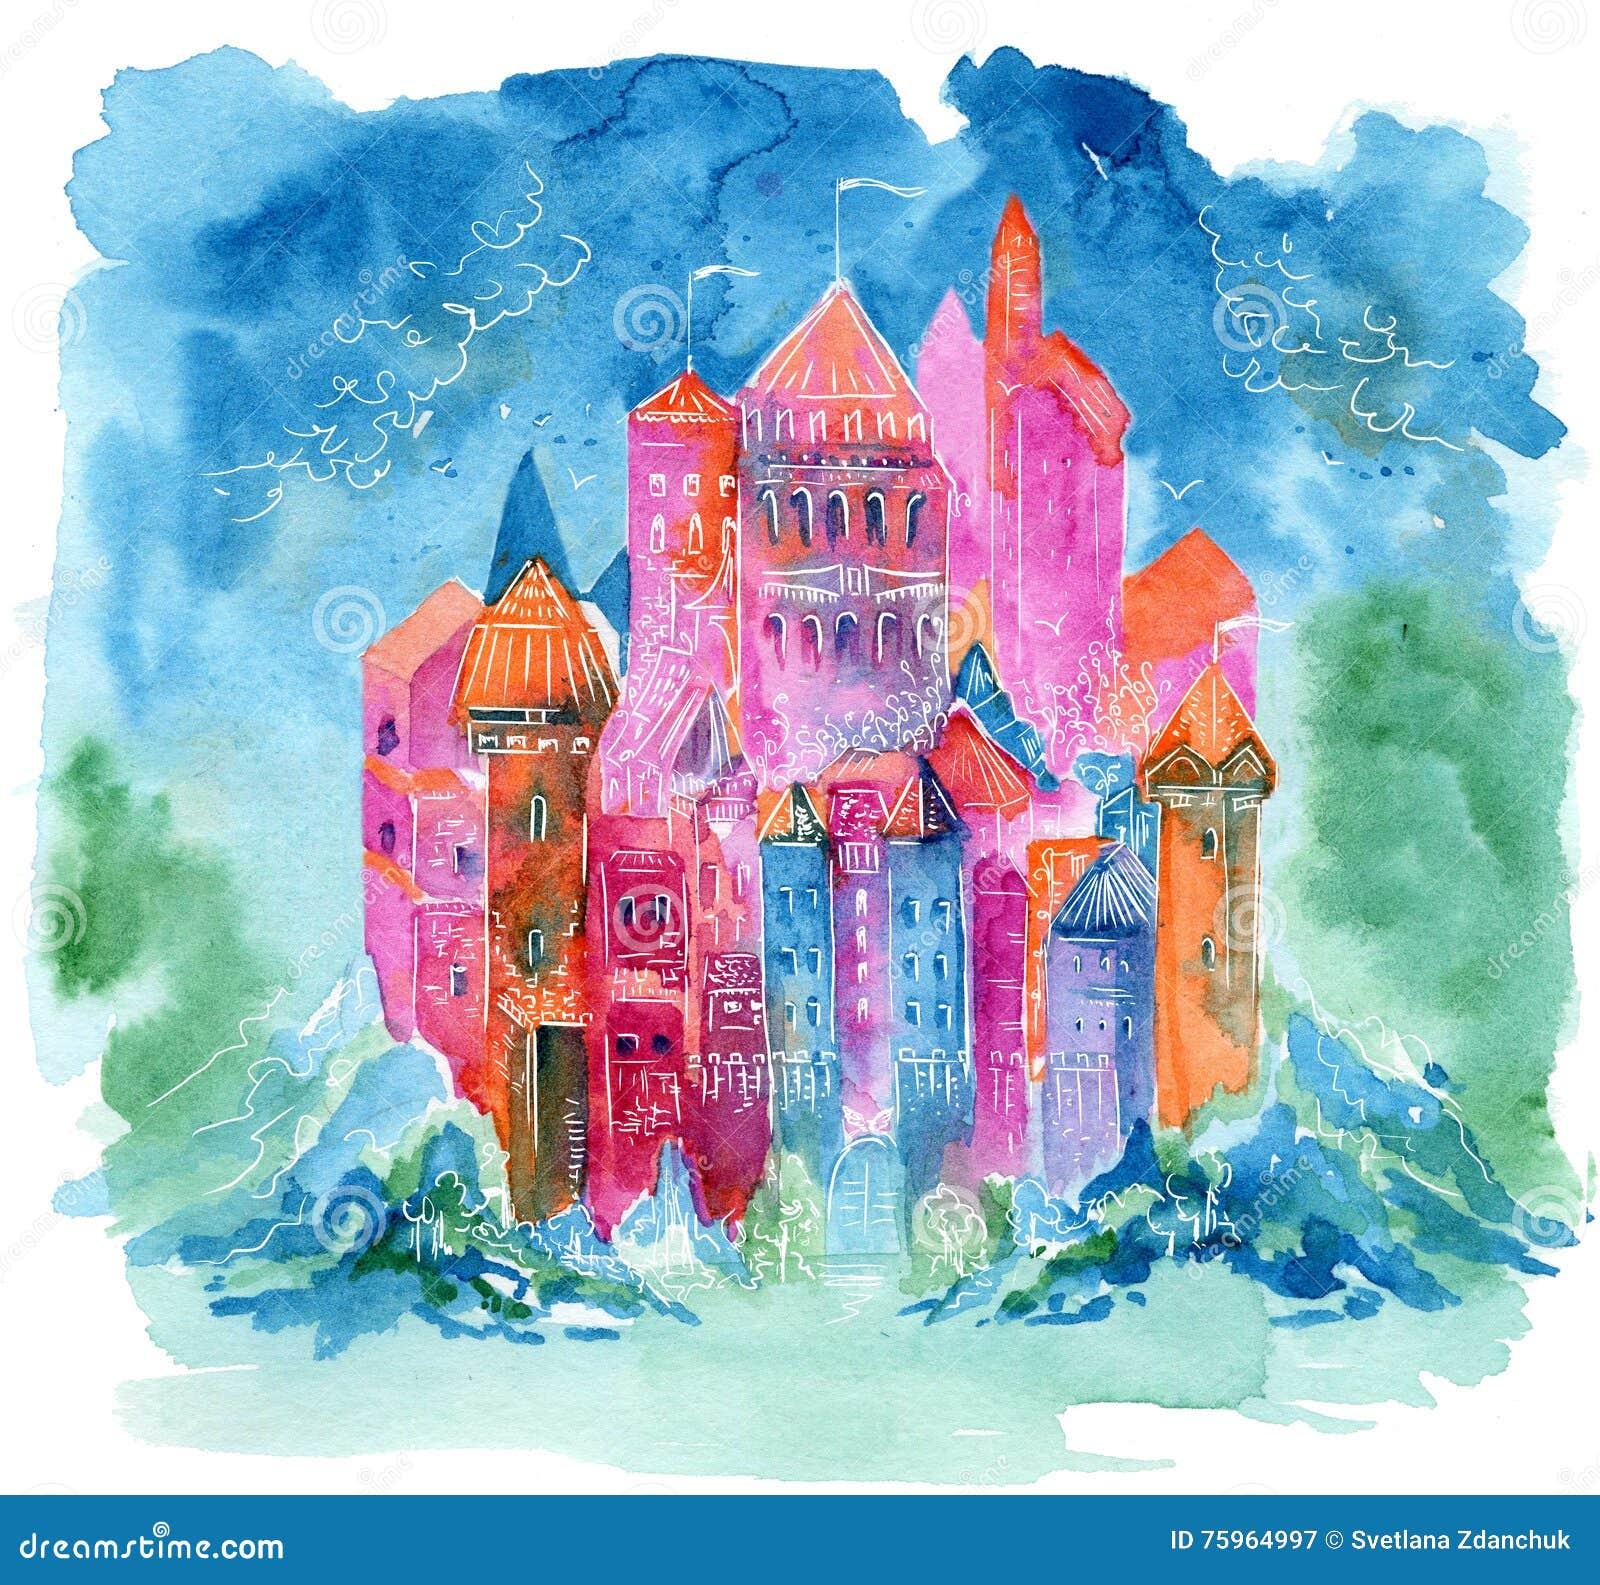 Book Cover Watercolor Hair : Rainbow castle fantasy watercolor illustration stock